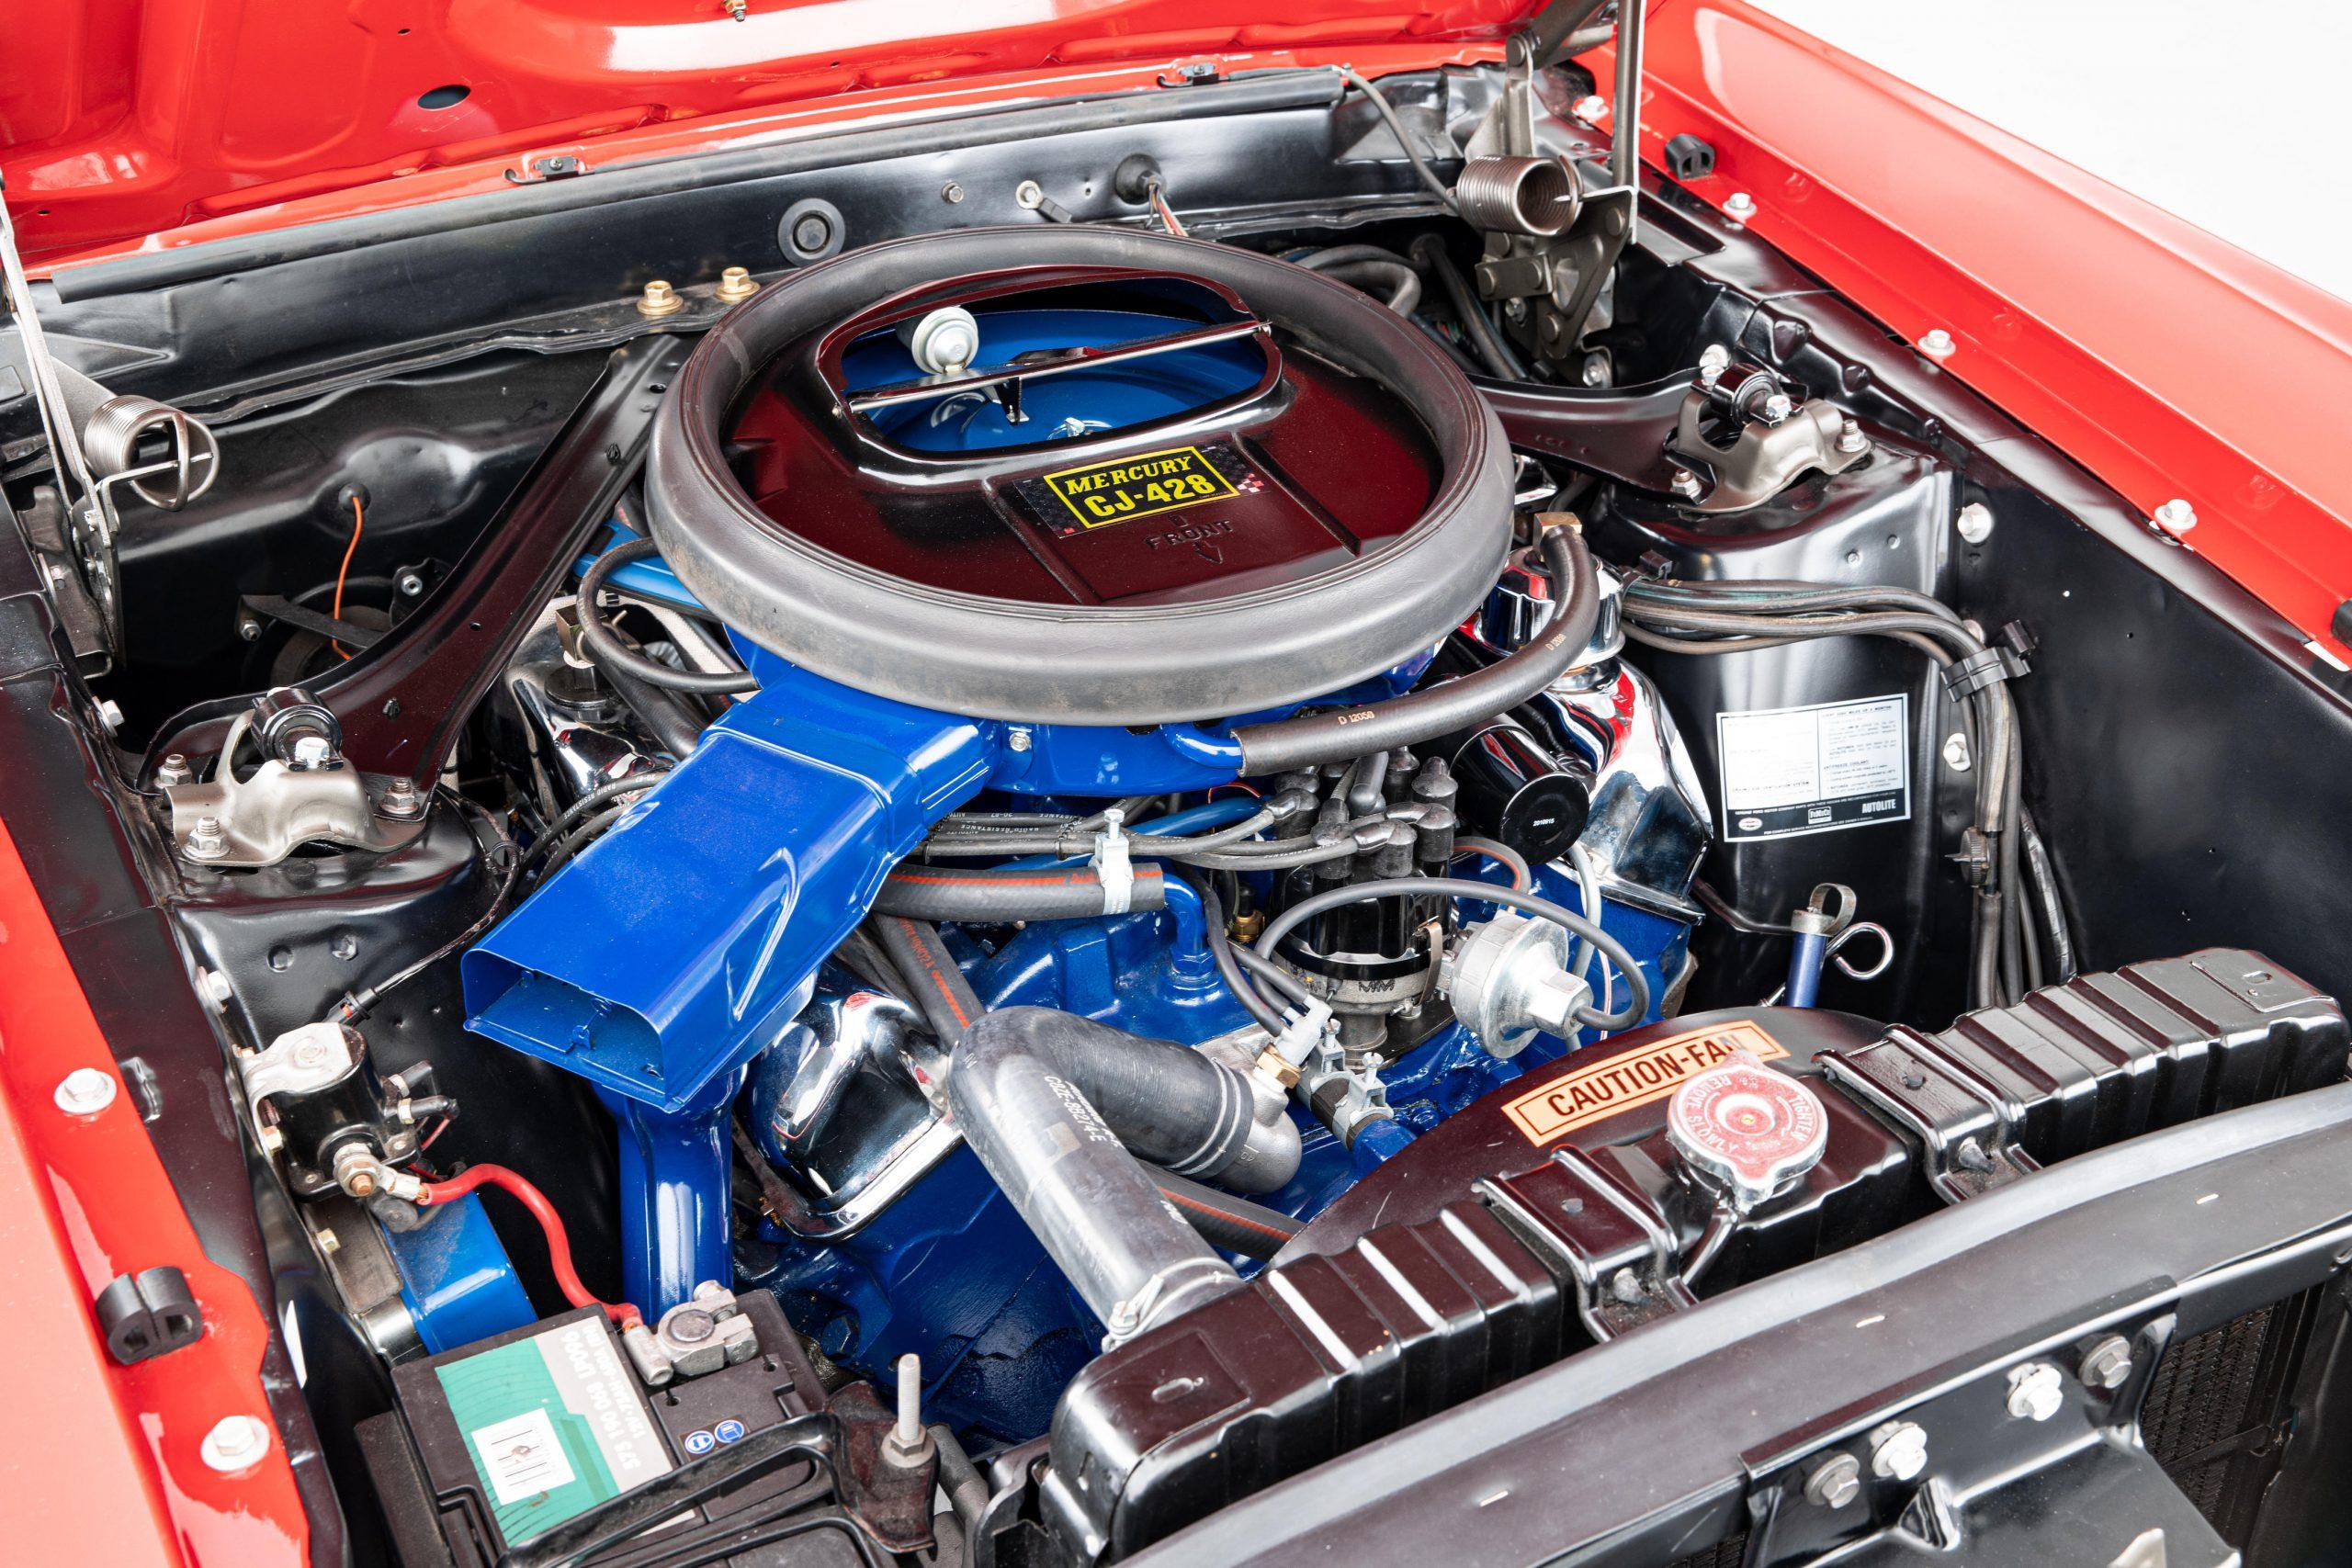 Mercury Cougar Convertible engine detail